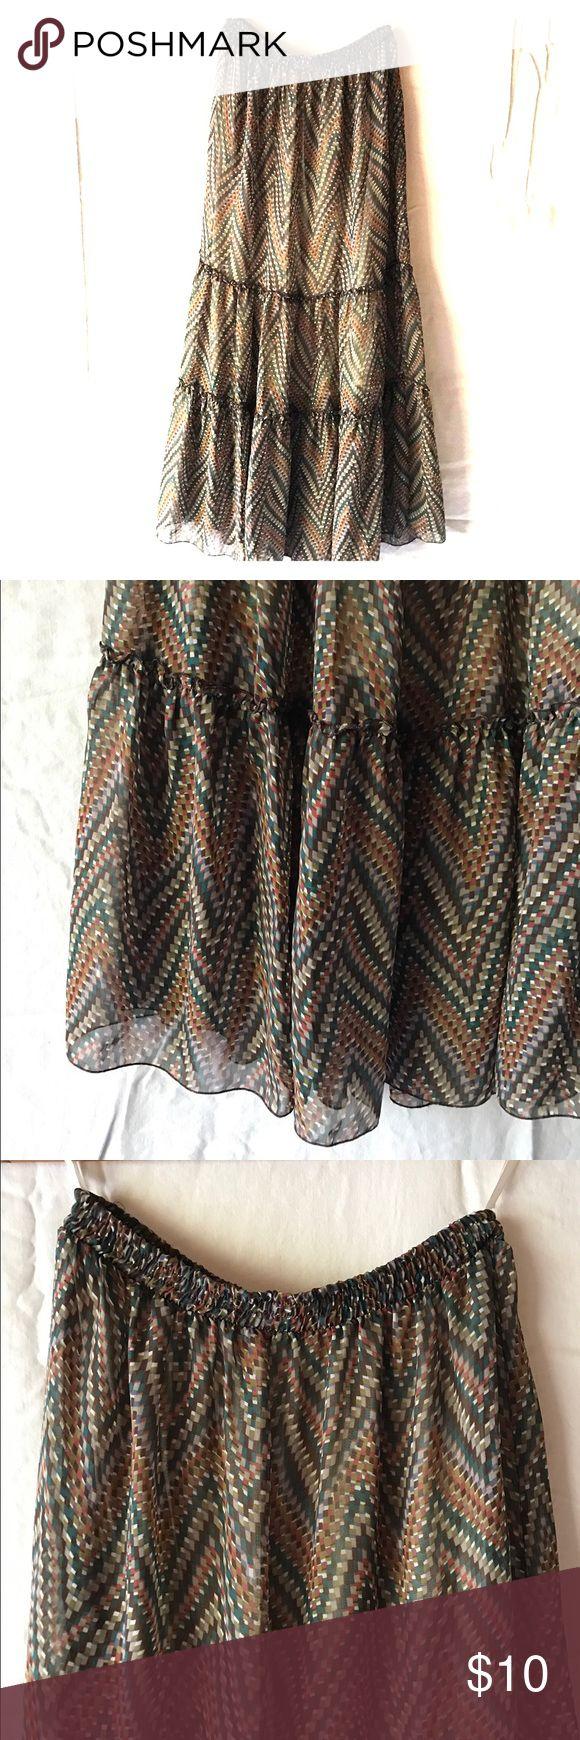 Flowy ruffled maxi skirt brown rust teal chevron Pretty flowy maxi skirt with ruffle tiers. Brown/rust/teal/orange chevron pattern sheer chiffon fabric with lining. Elastic waist. Skirts Maxi